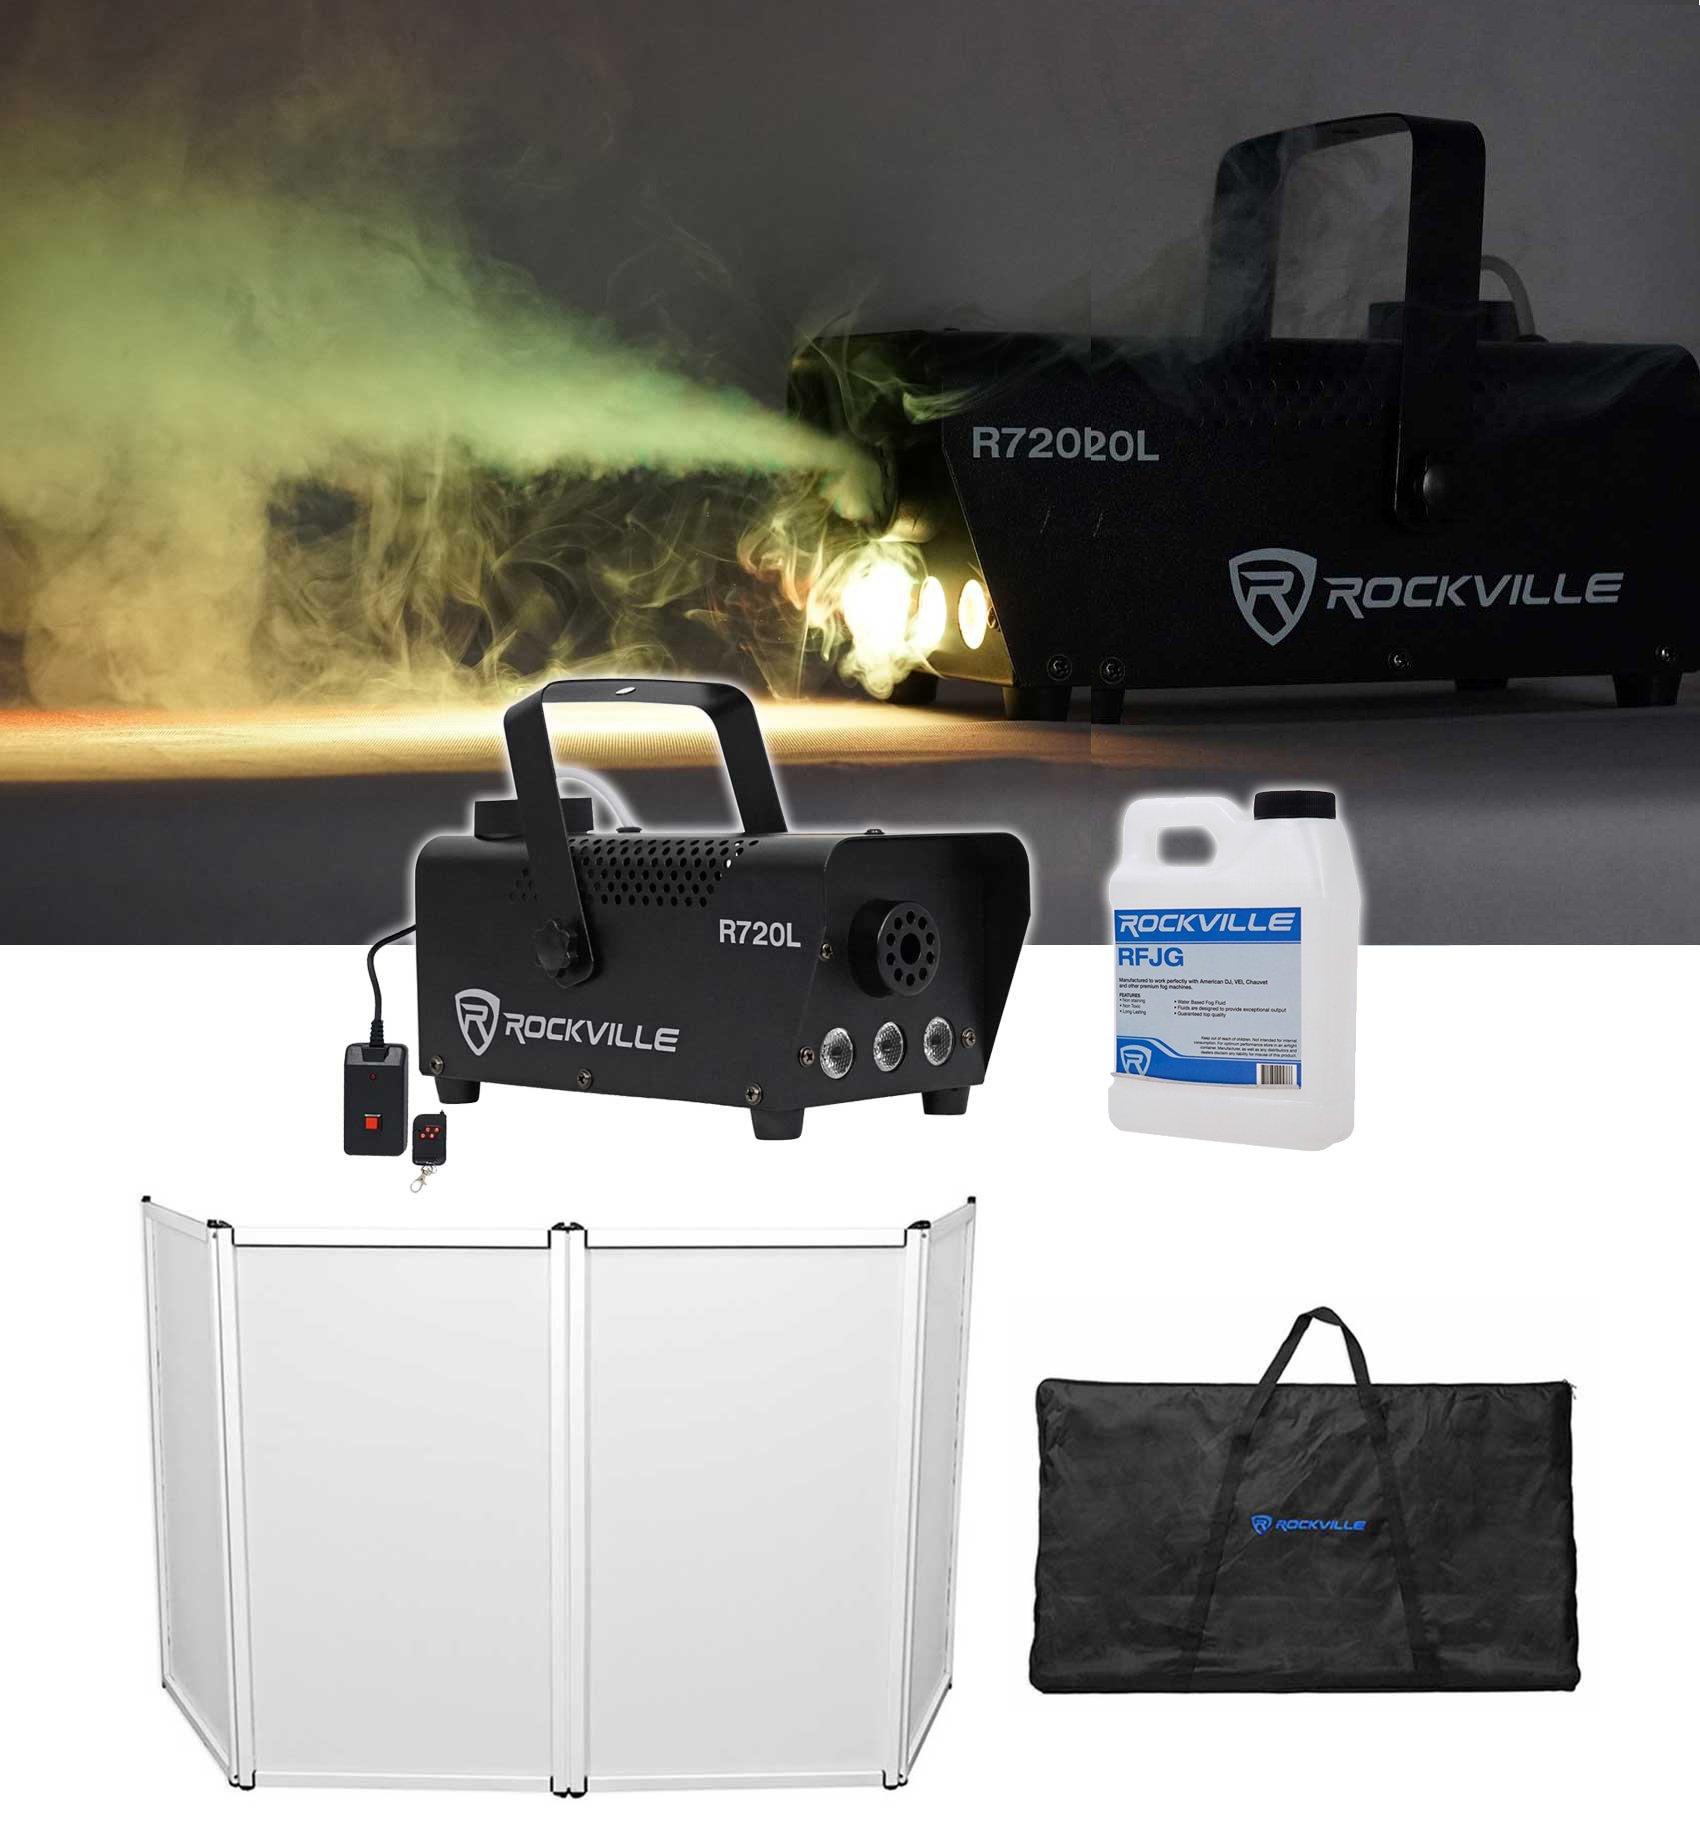 Rockville RFAAW DJ Event Facade Booth+Travel Bag+Scrim+LED Fog Machine+Juice